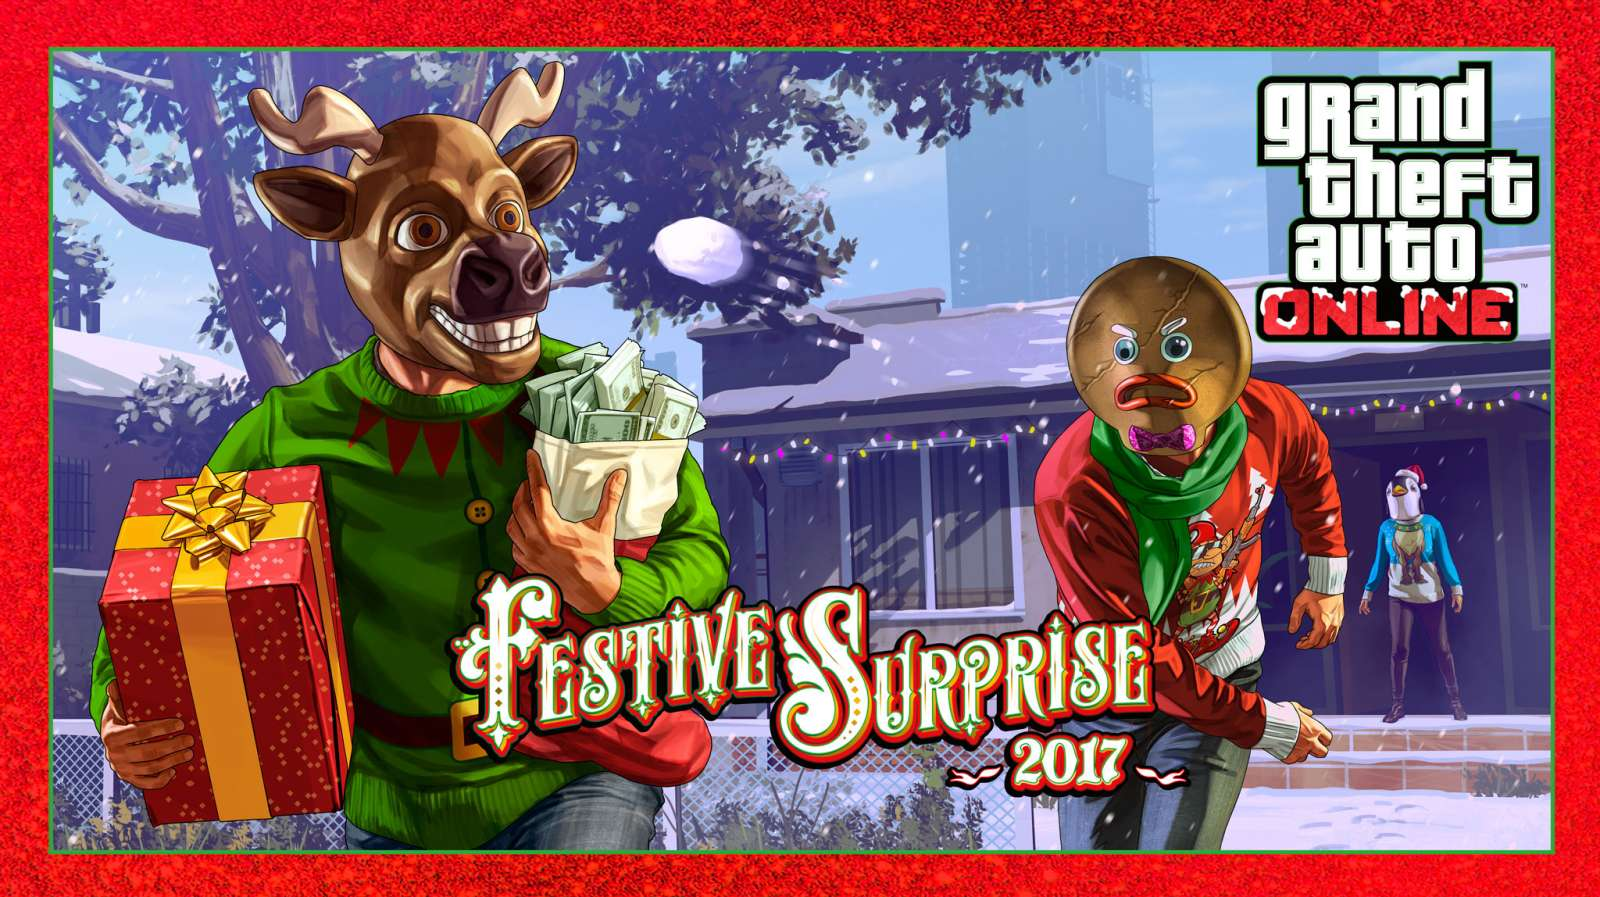 Vánoce v GTA Online! Festive Surprise je tady! Miroslav Biarinec 401934954dd